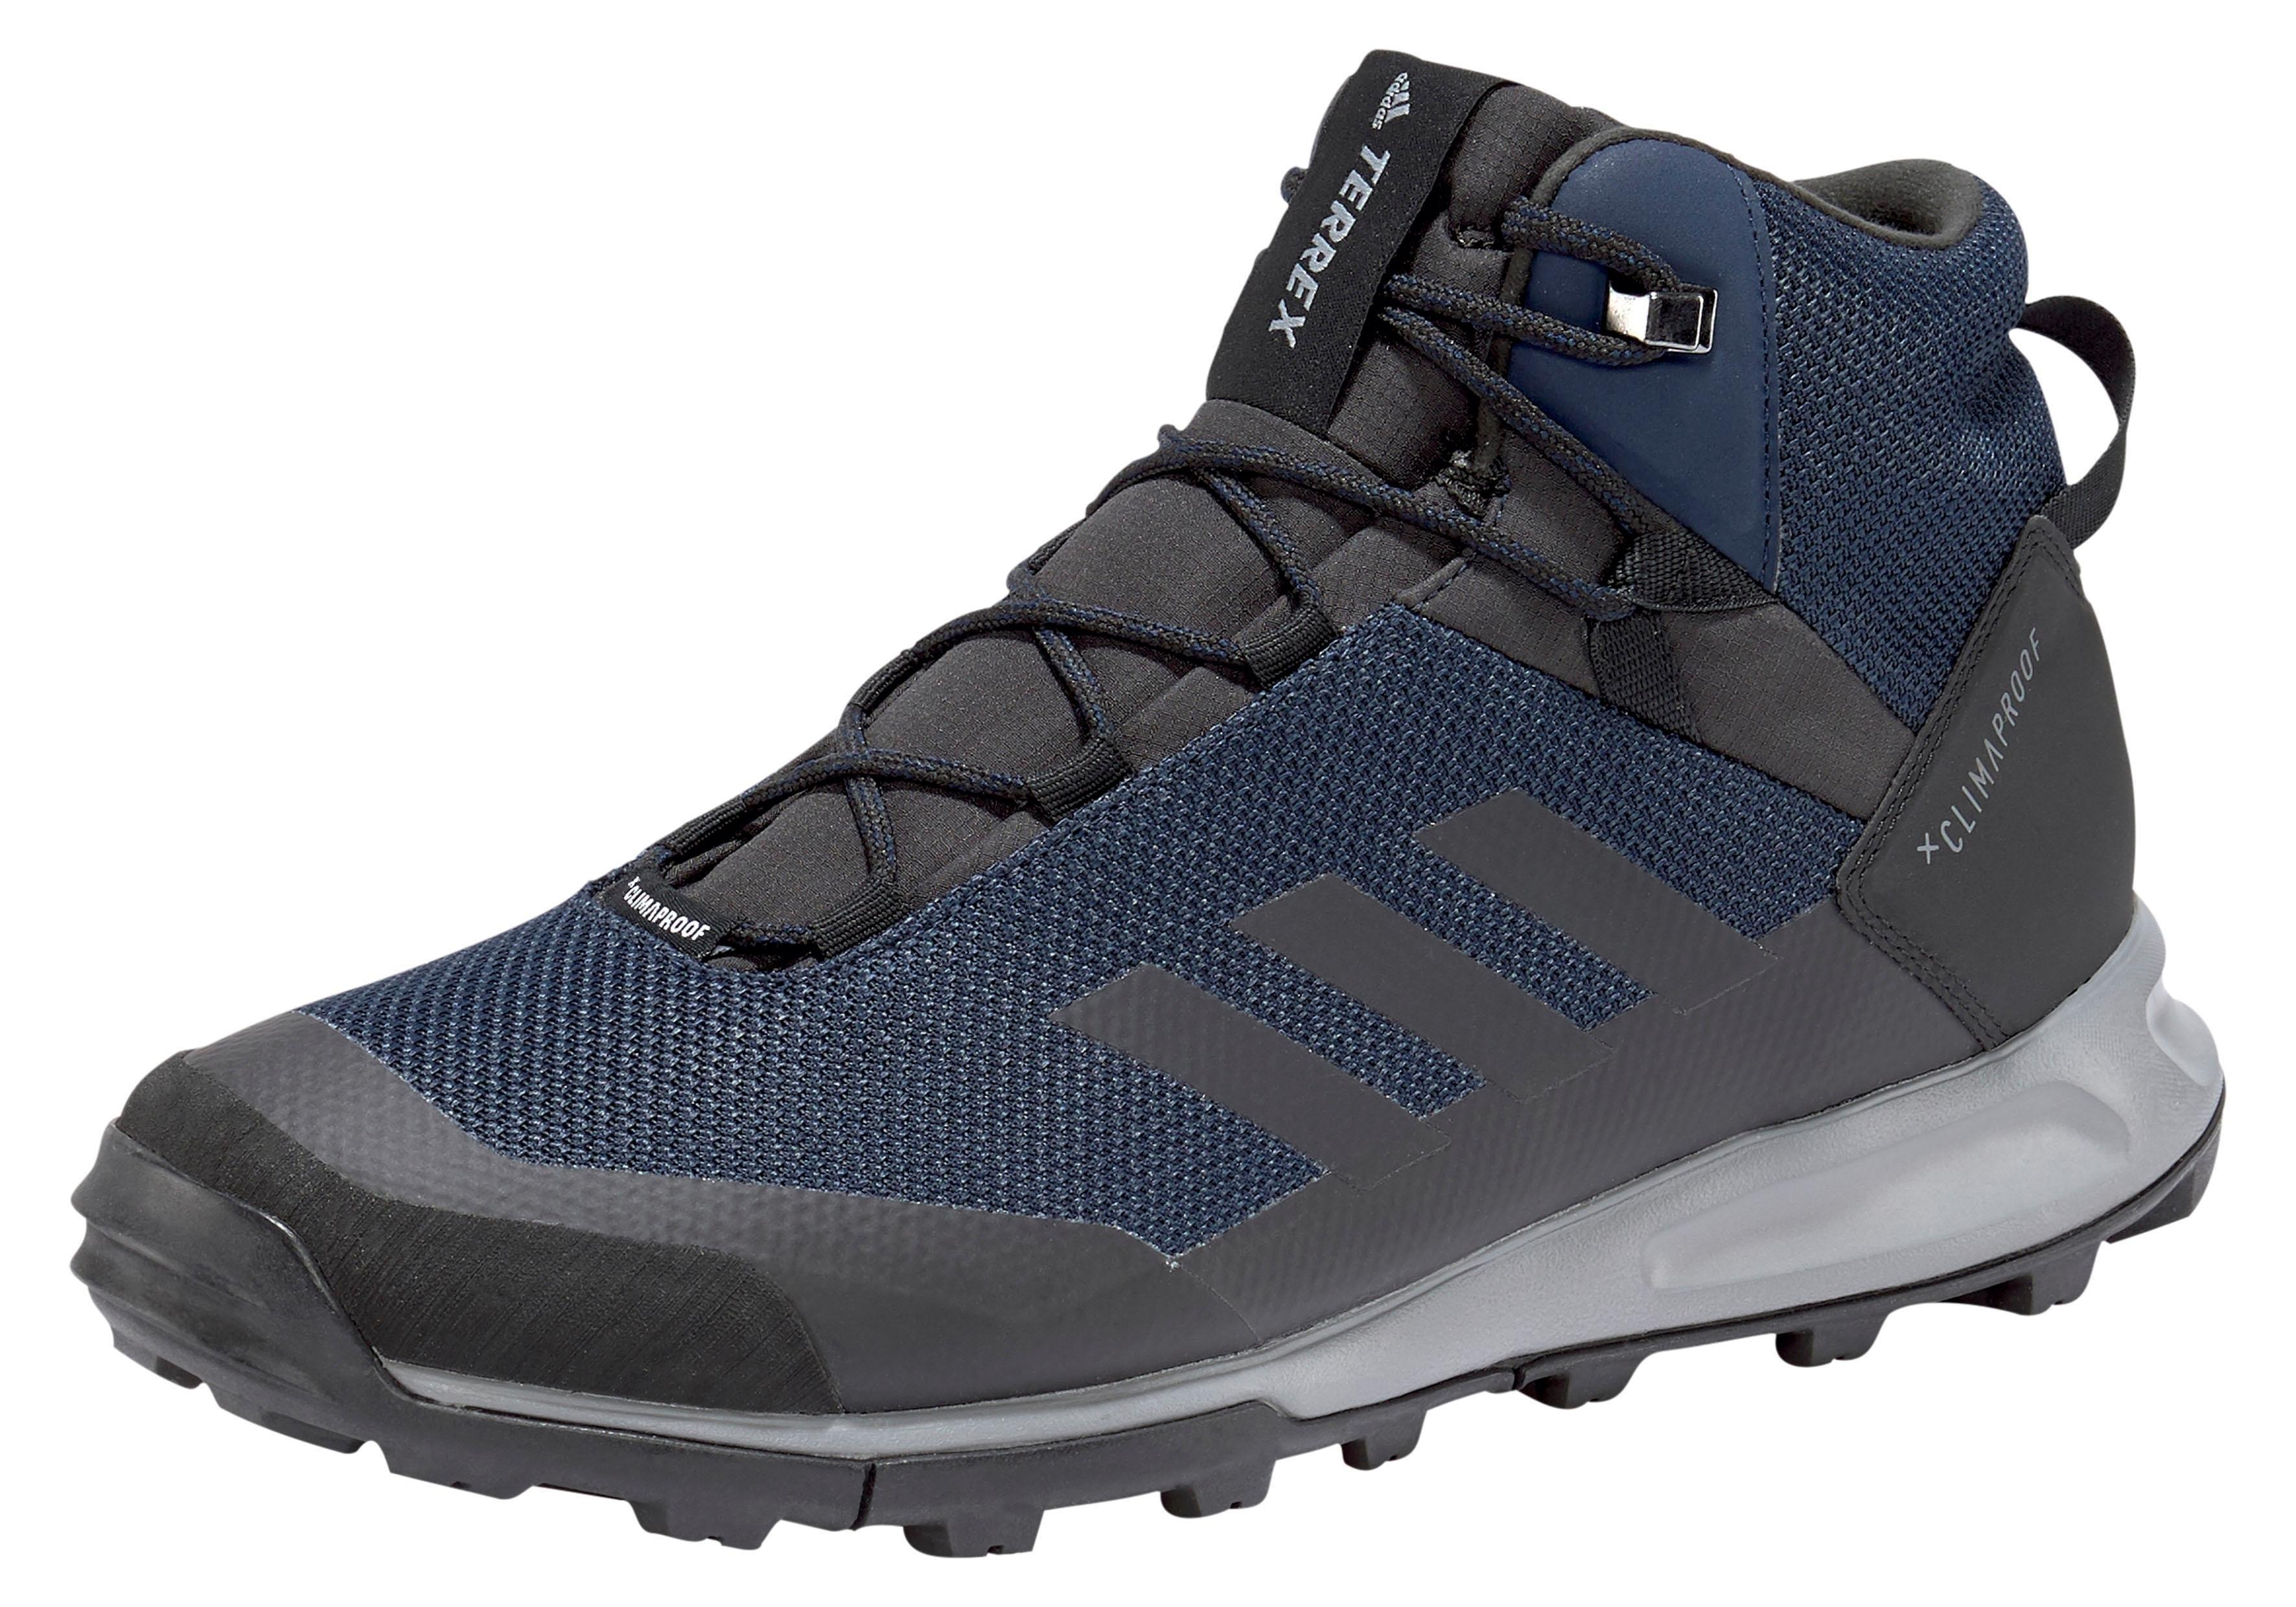 Adidas Terrex adidas Performance outdoorschoenen »TERREX TIVID MID CLIMAPROOF« nu online bestellen